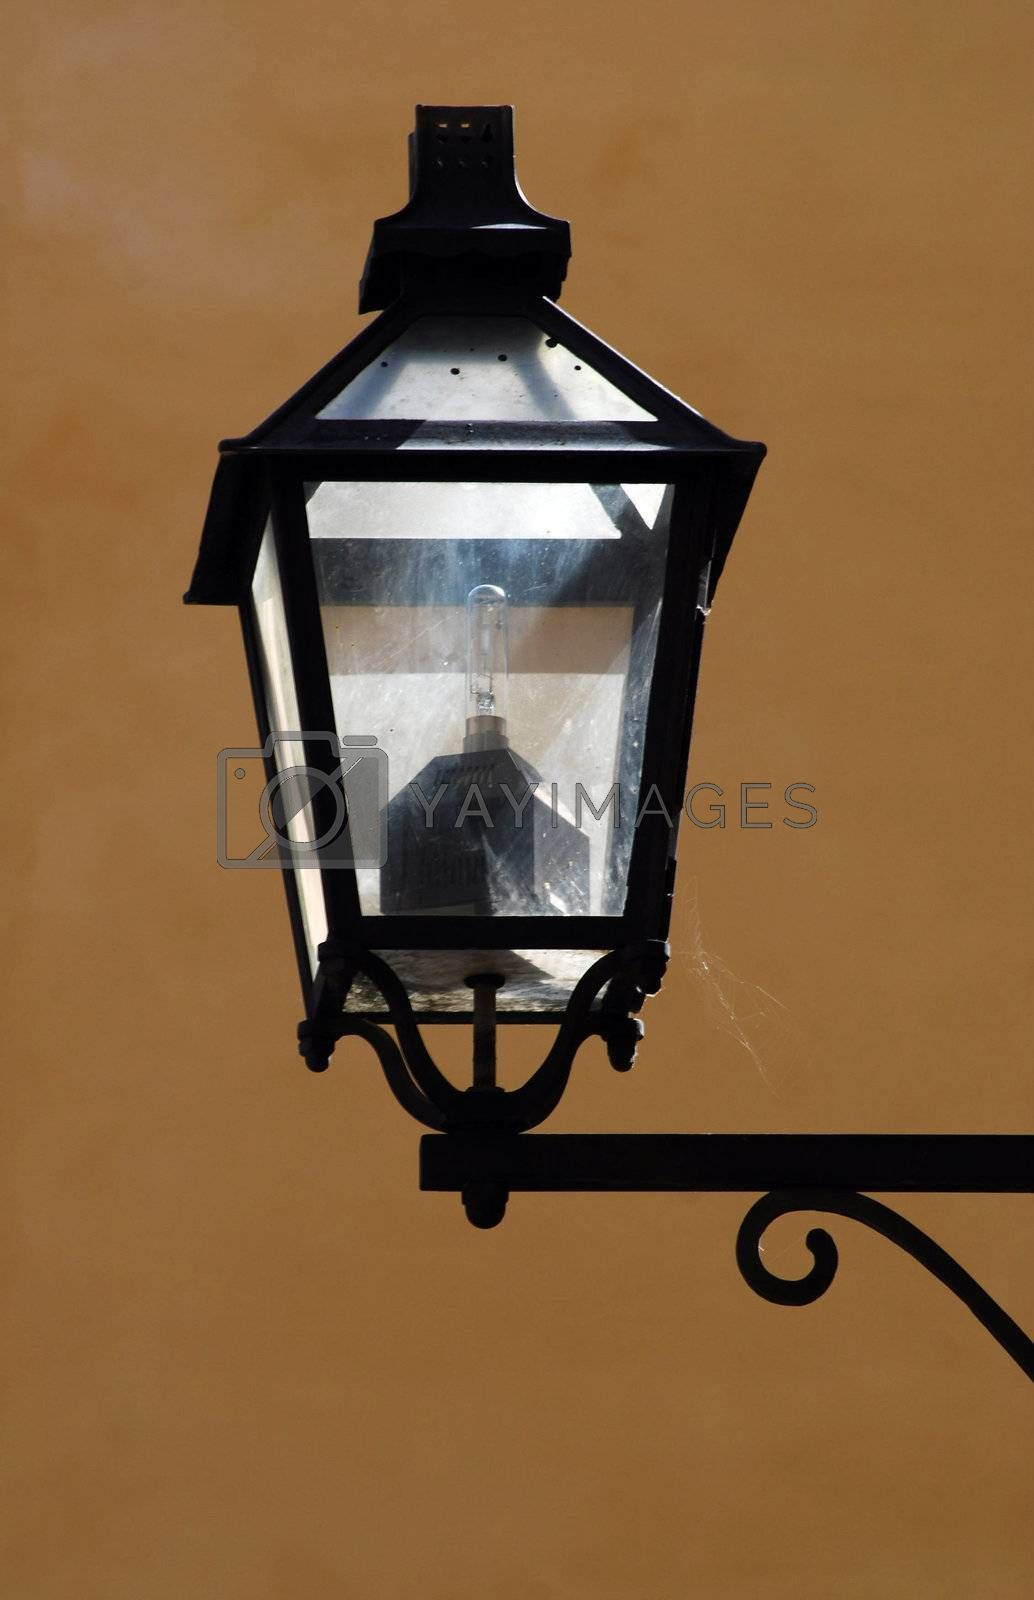 Streetlamp by windmill